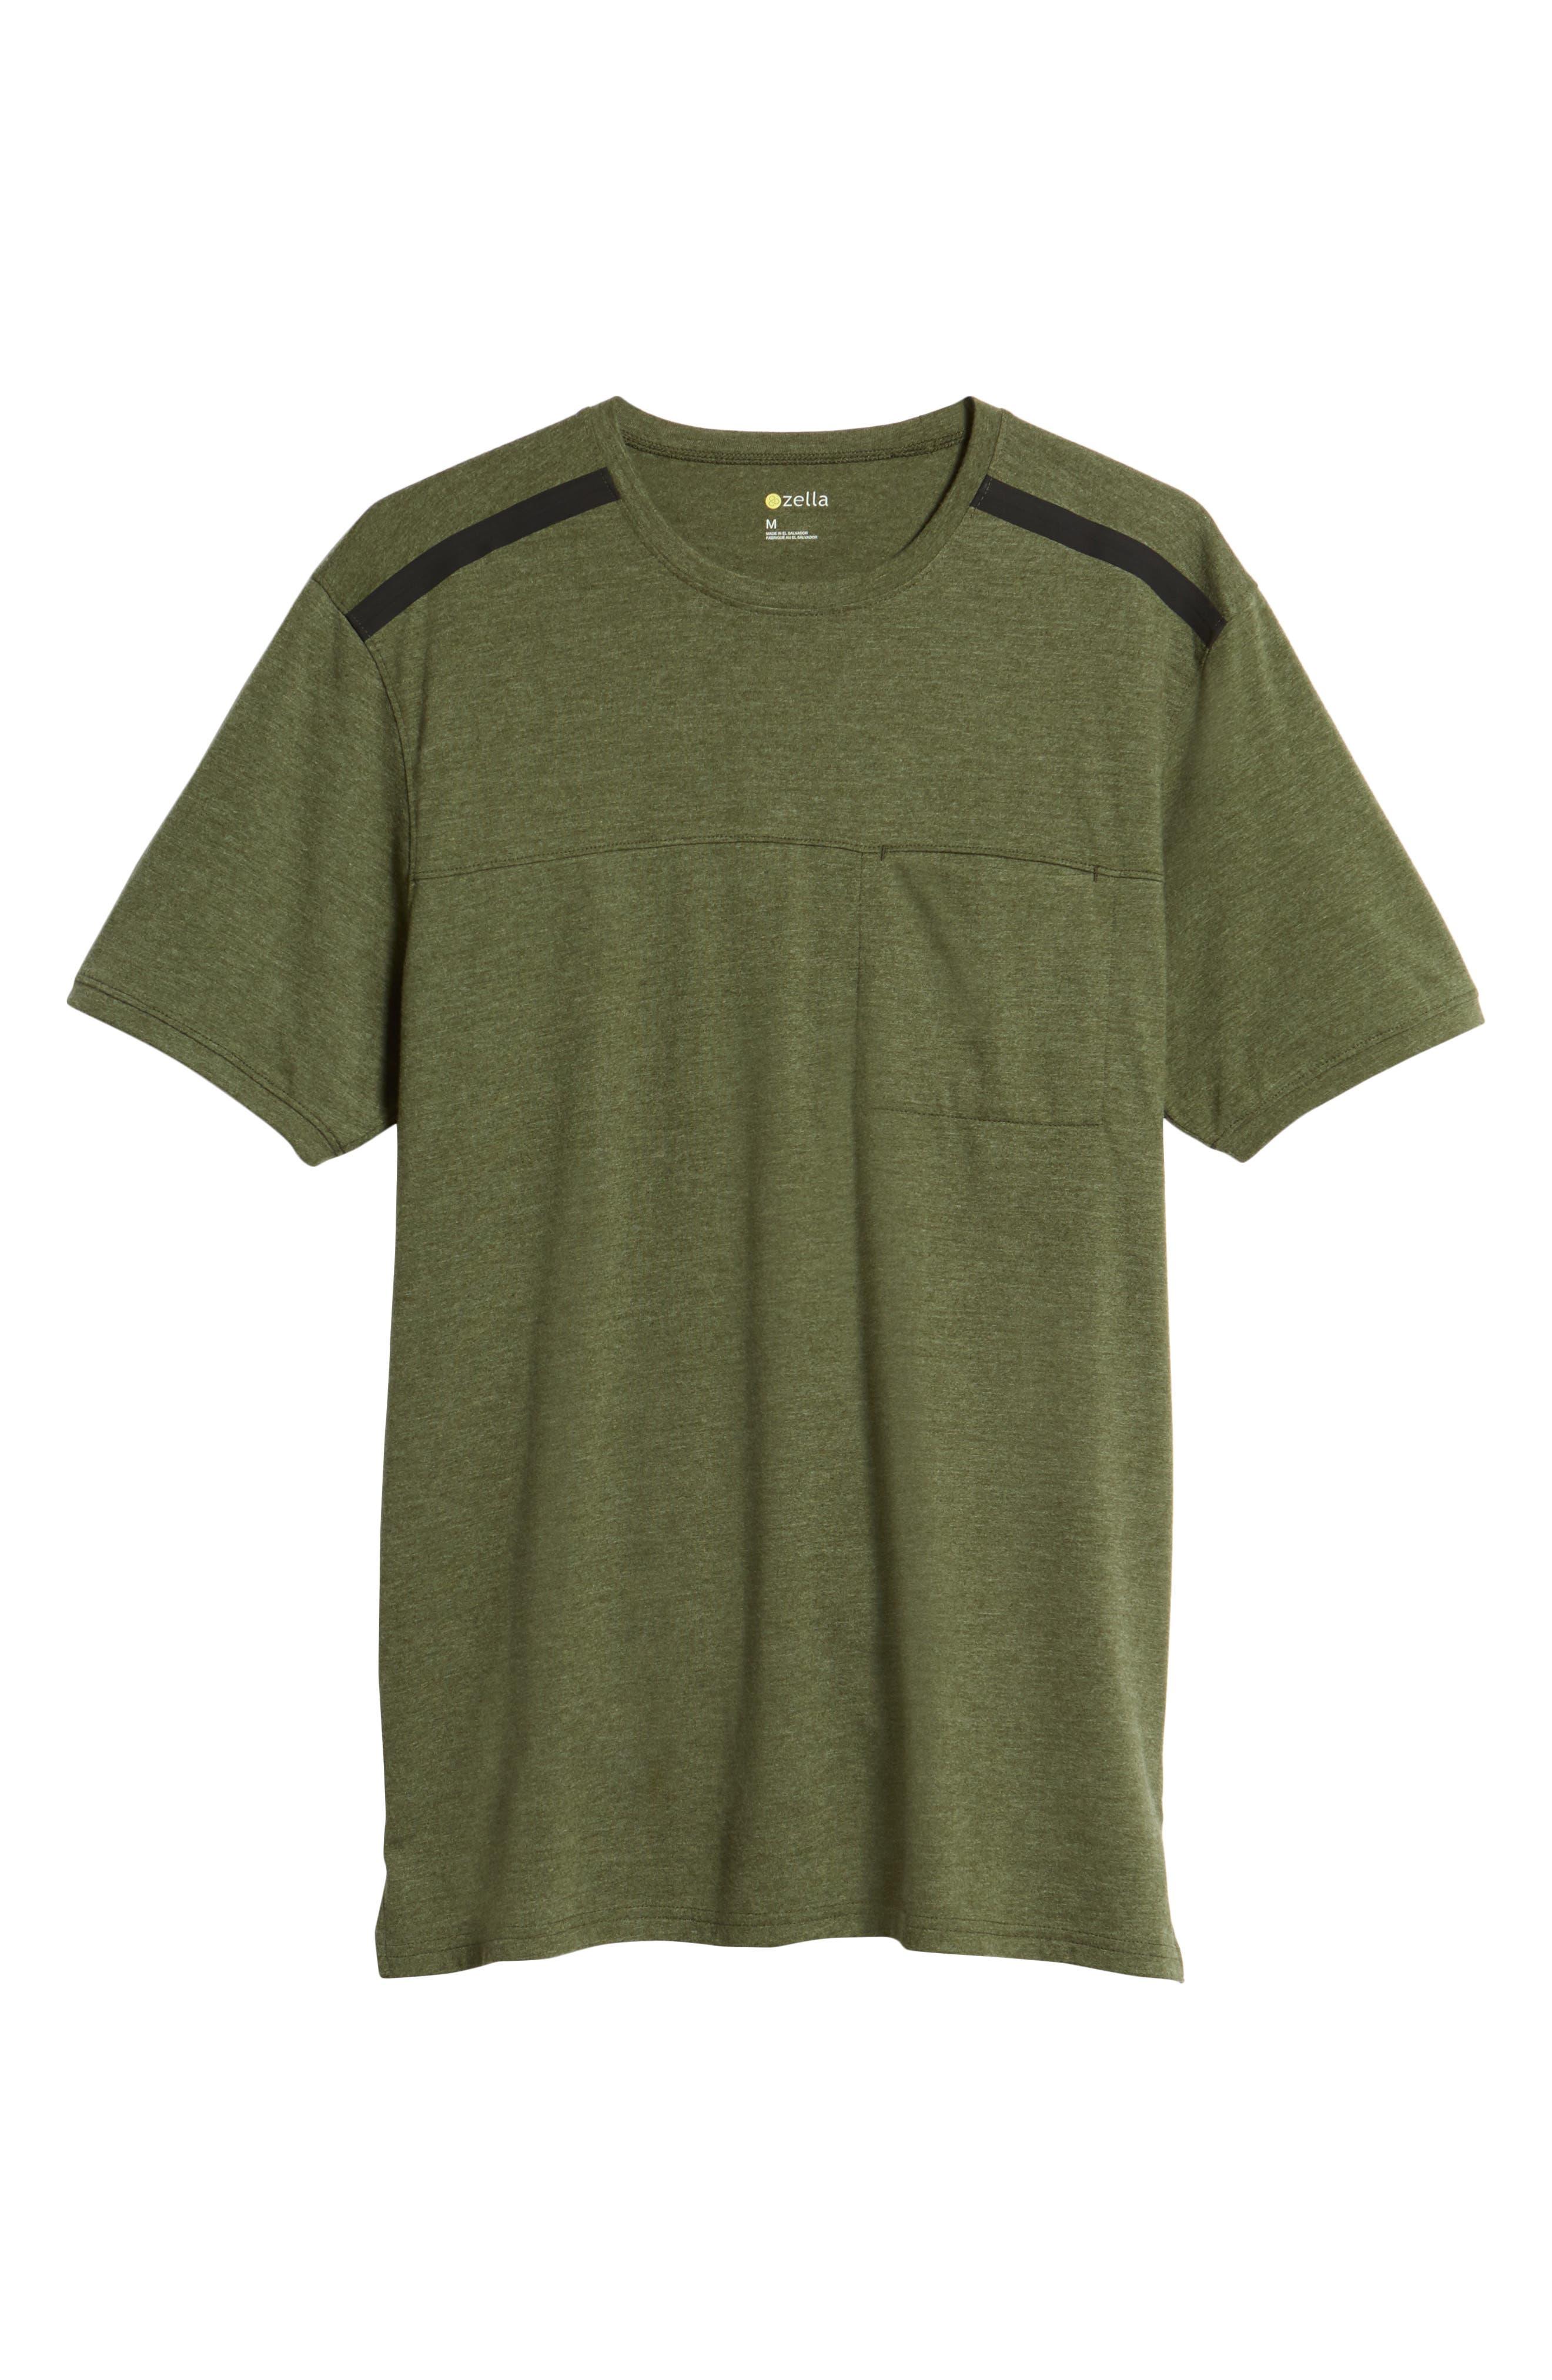 Perfomance T-Shirt,                             Alternate thumbnail 6, color,                             GREEN TACTICAL MELANGE